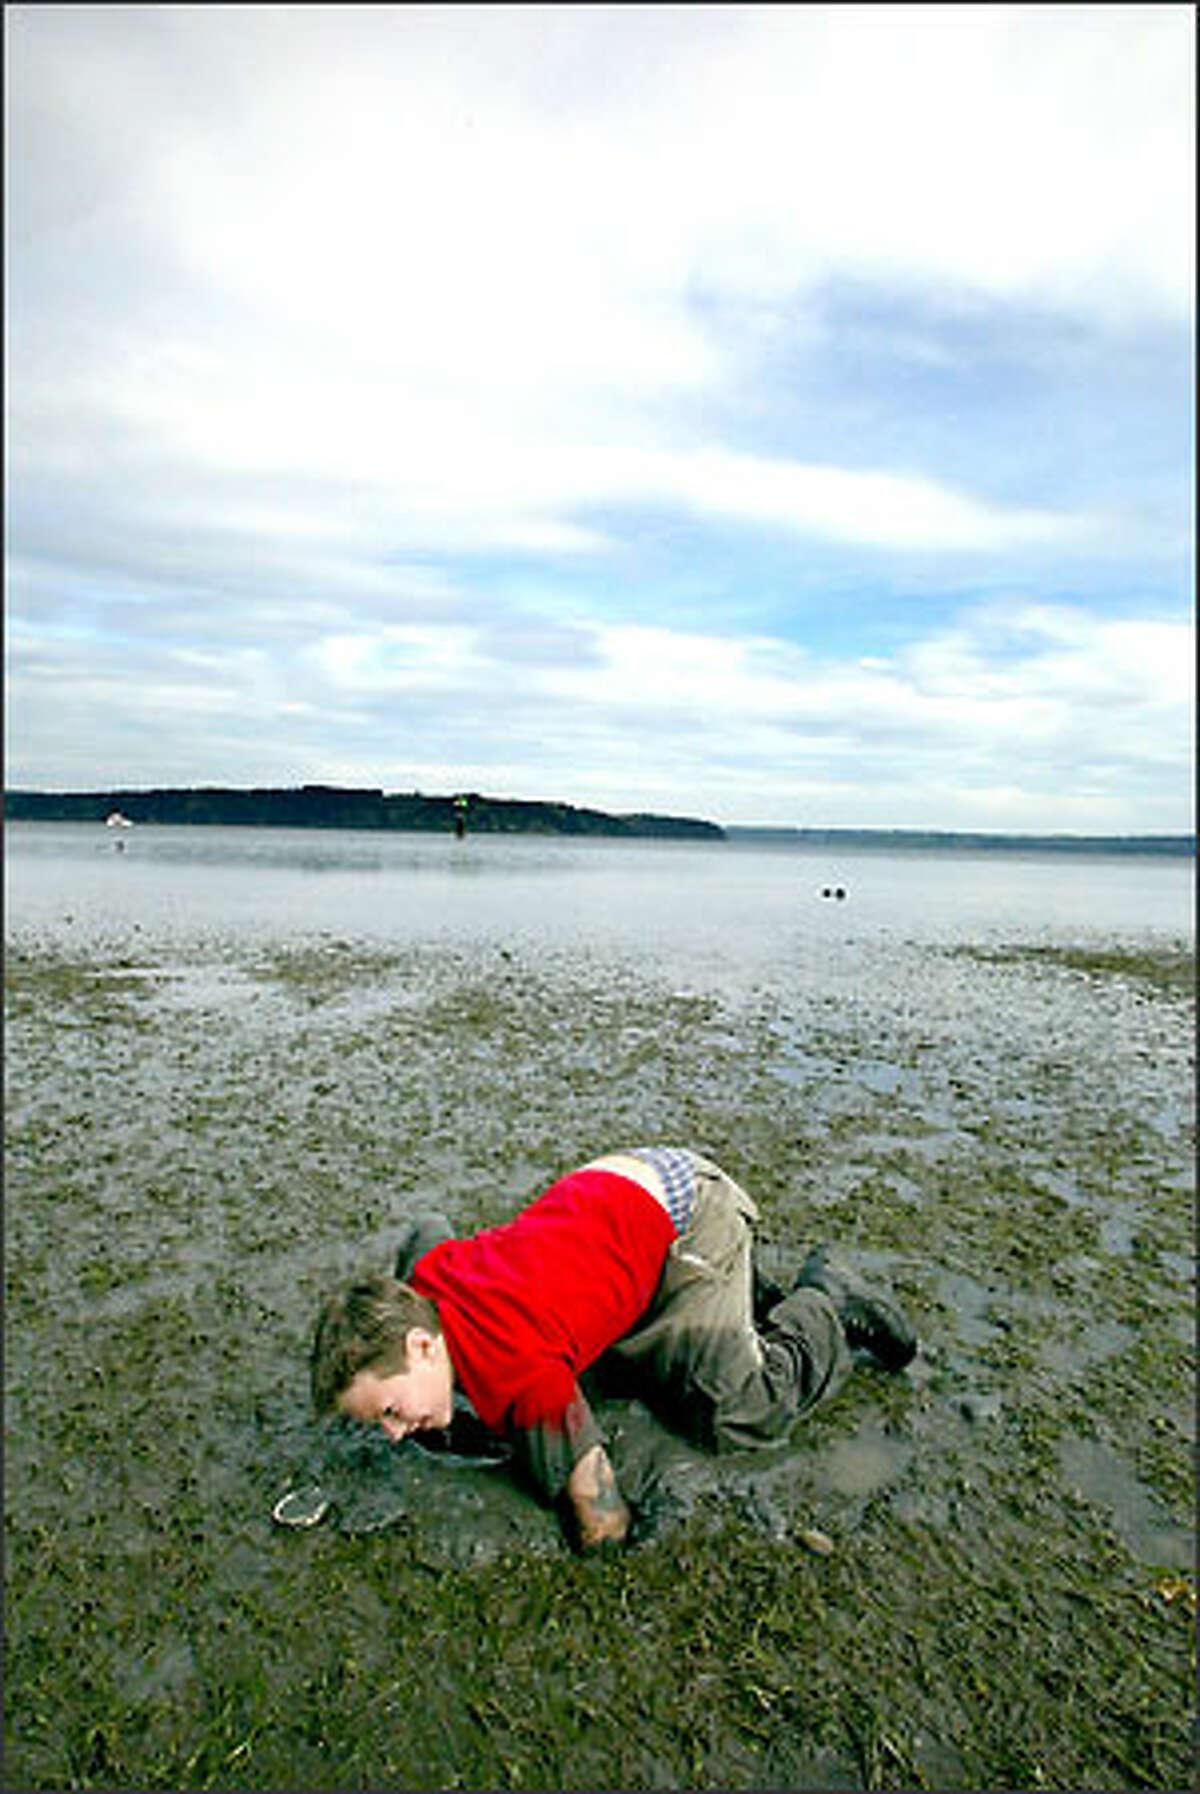 Jasper Hendricks, 11, of Brinnon, digs for geoducks on the tideflats at Dosewallips State Park.